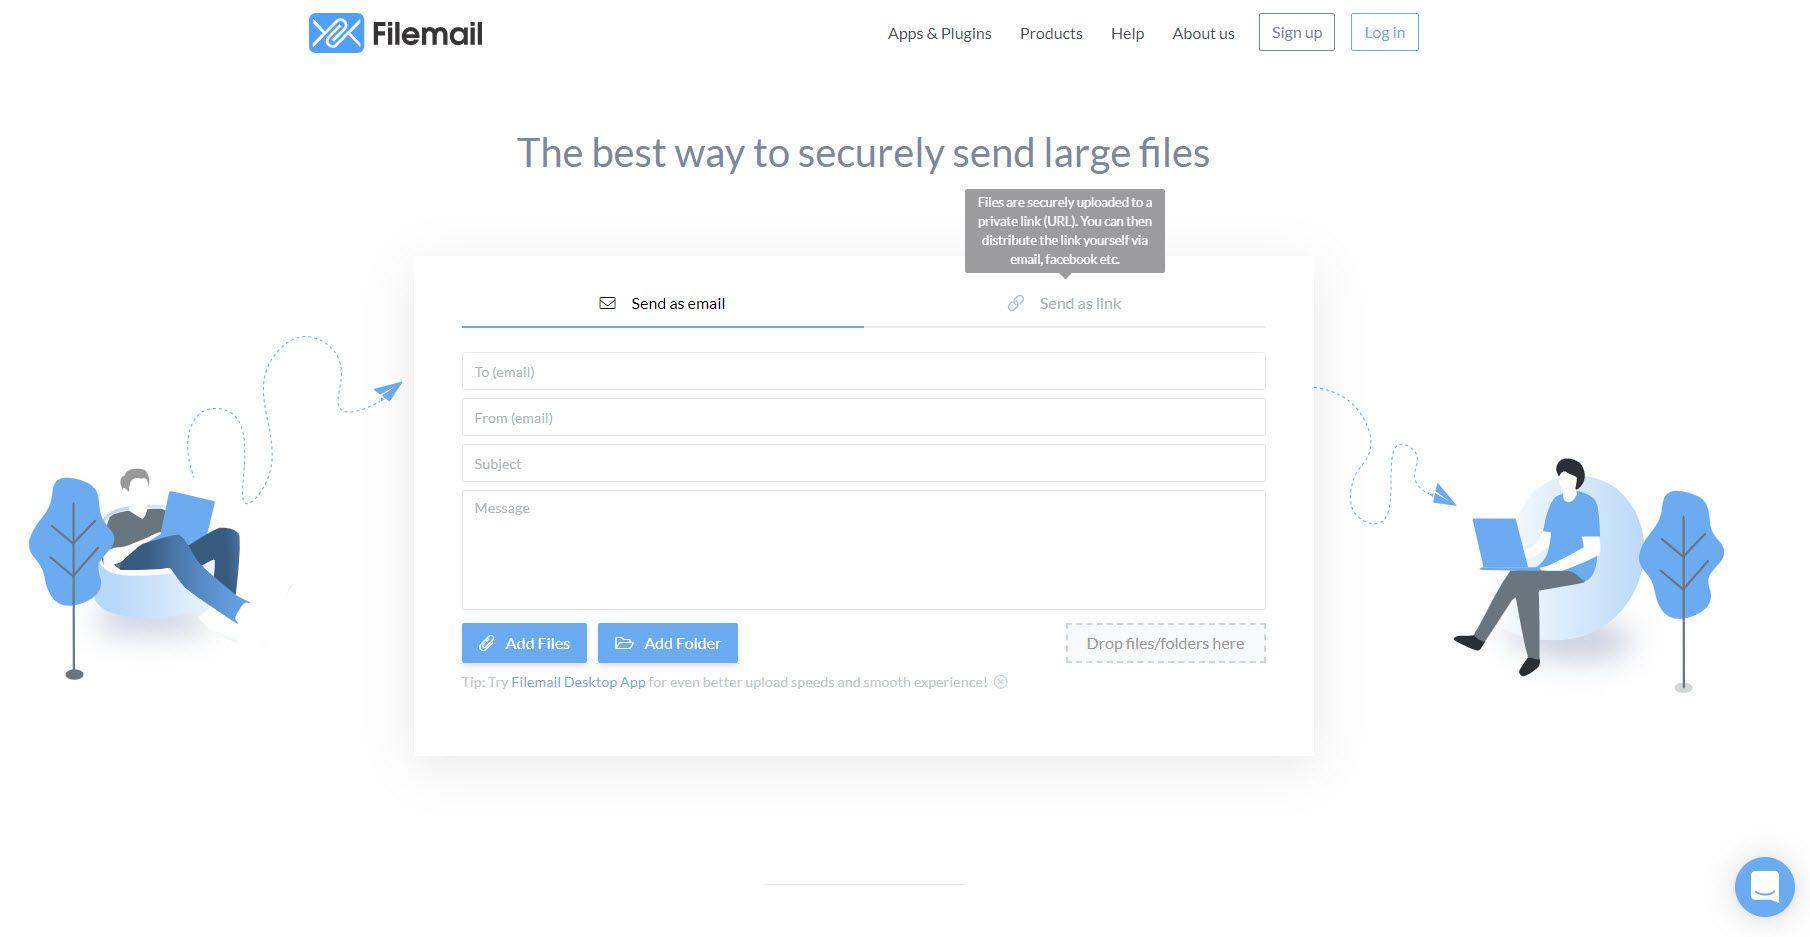 A screenshot of the Filemail website.